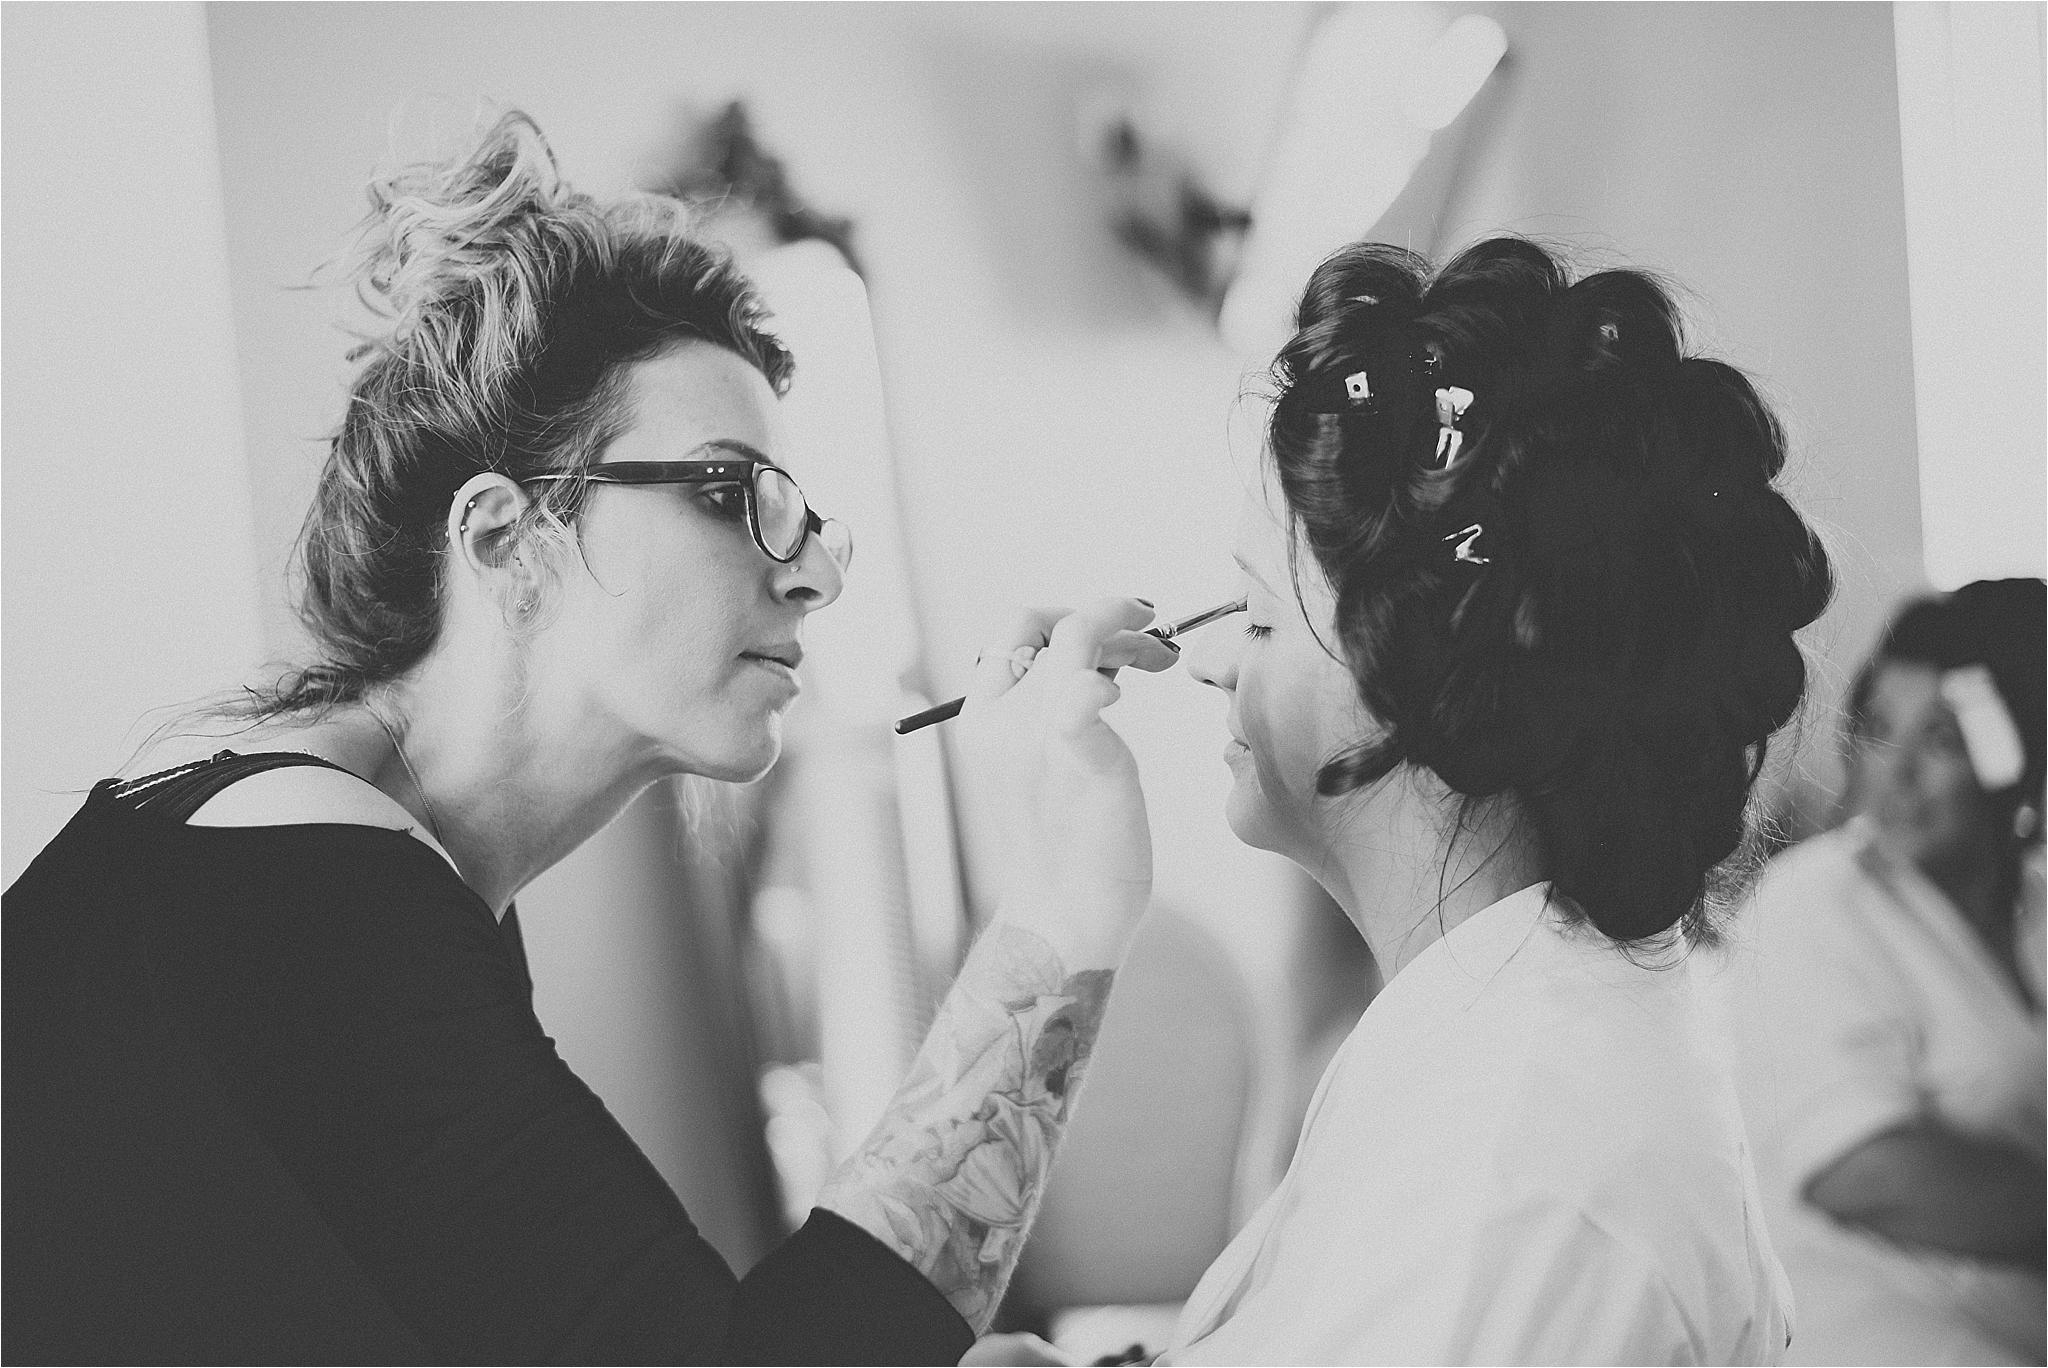 thevilla+lancashire+wreagreen+wedding+photographer6.jpg